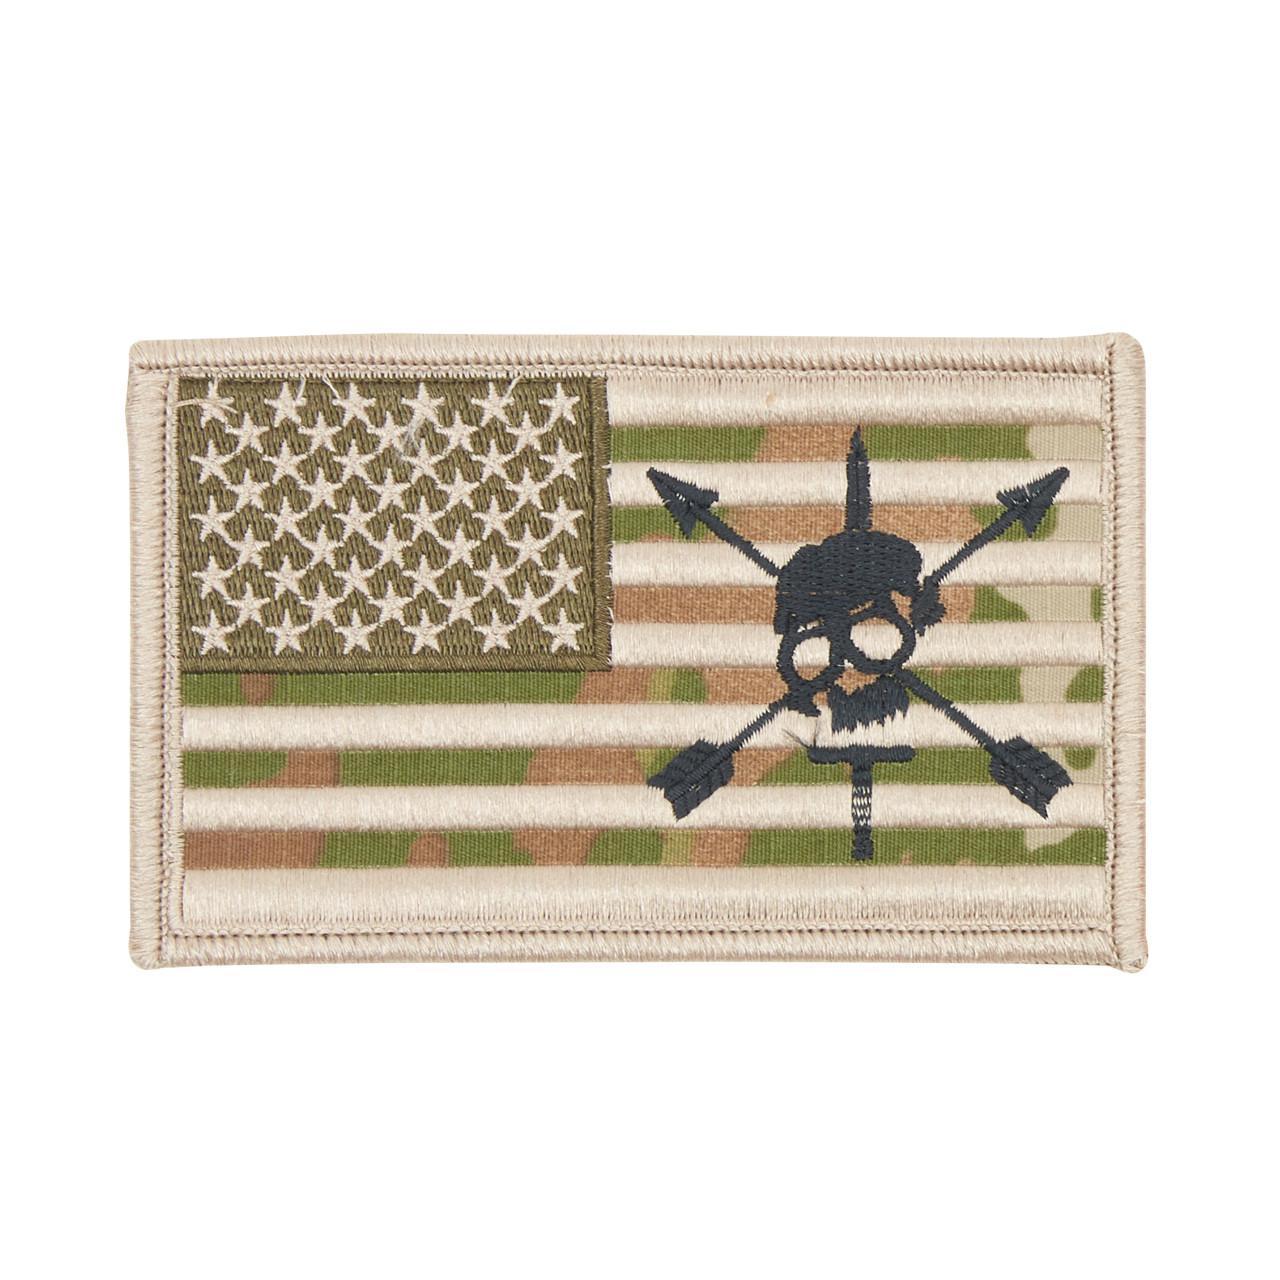 52698 LARGE MULTICAM SPECIAL FORCES FLAG PATCH